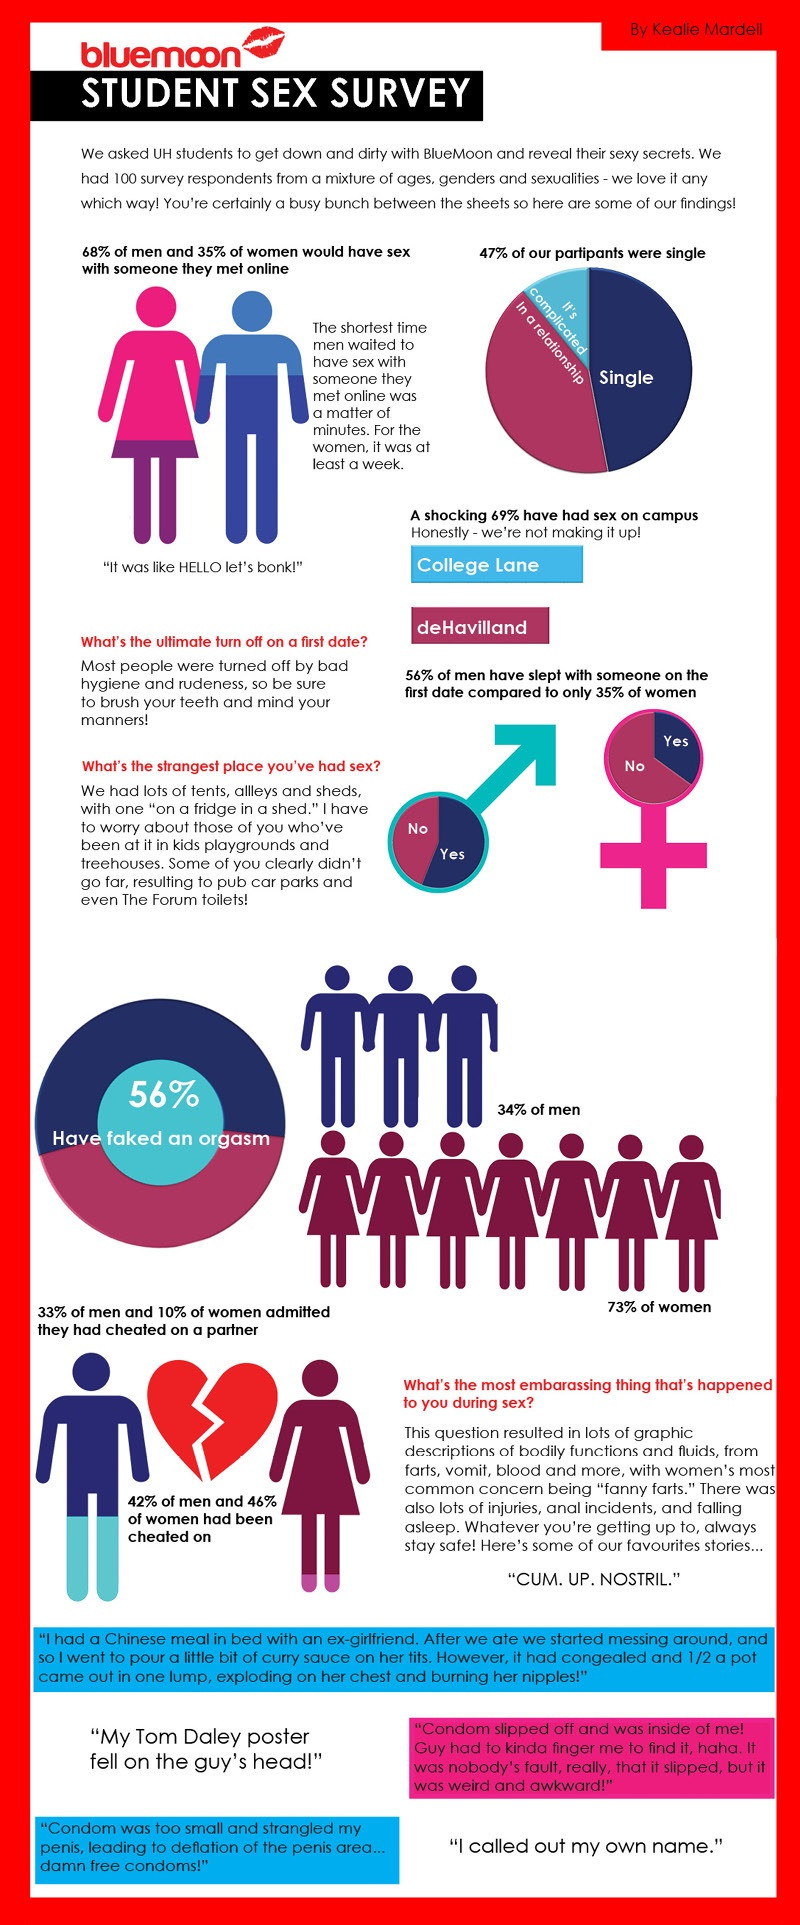 BlueMoon Student Sex Survey - Kealie Mardell